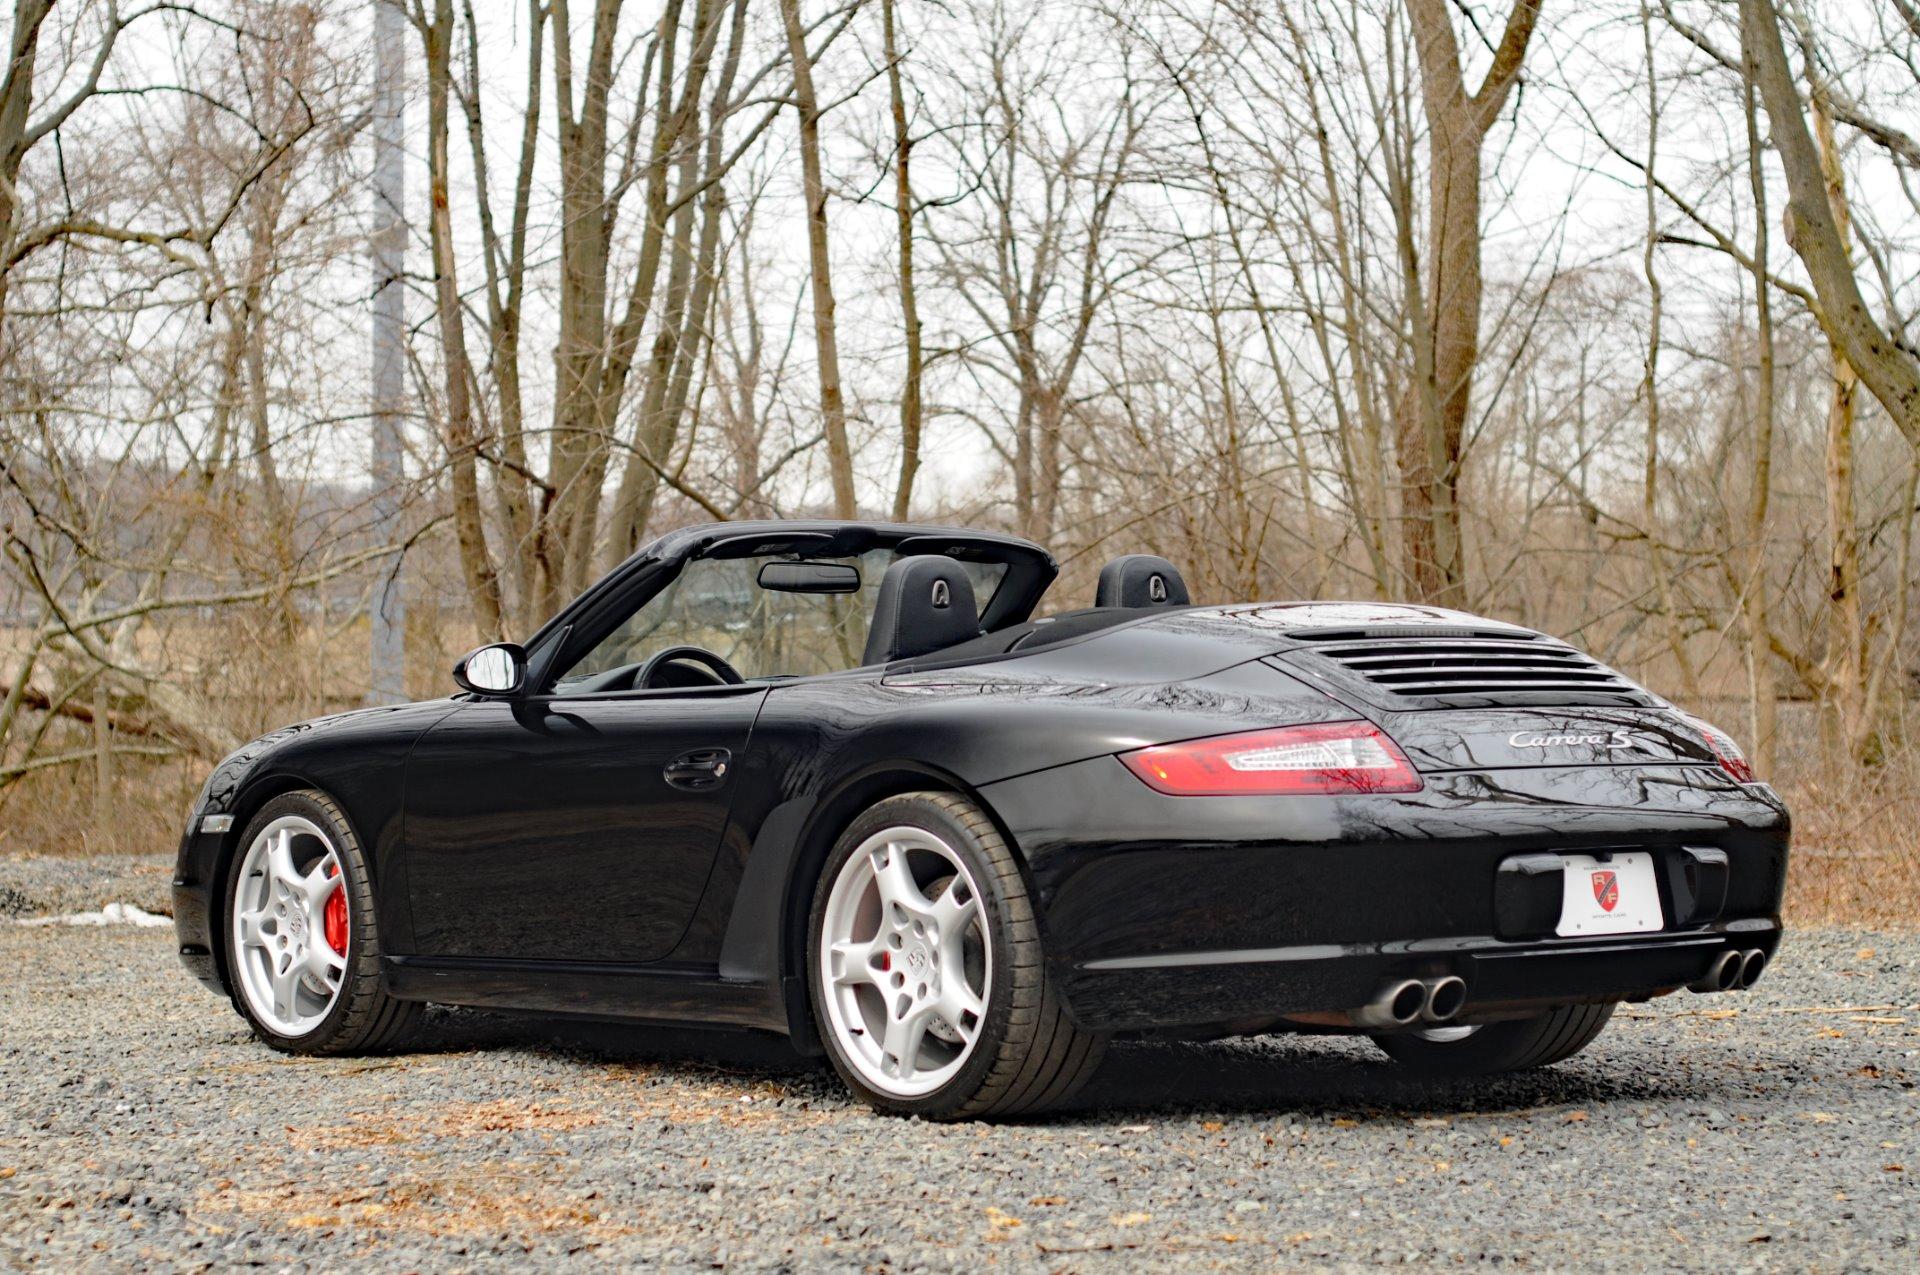 2006 porsche 911 carrera s cabriolet carrera s stock 2396 for sale near peapack nj nj. Black Bedroom Furniture Sets. Home Design Ideas